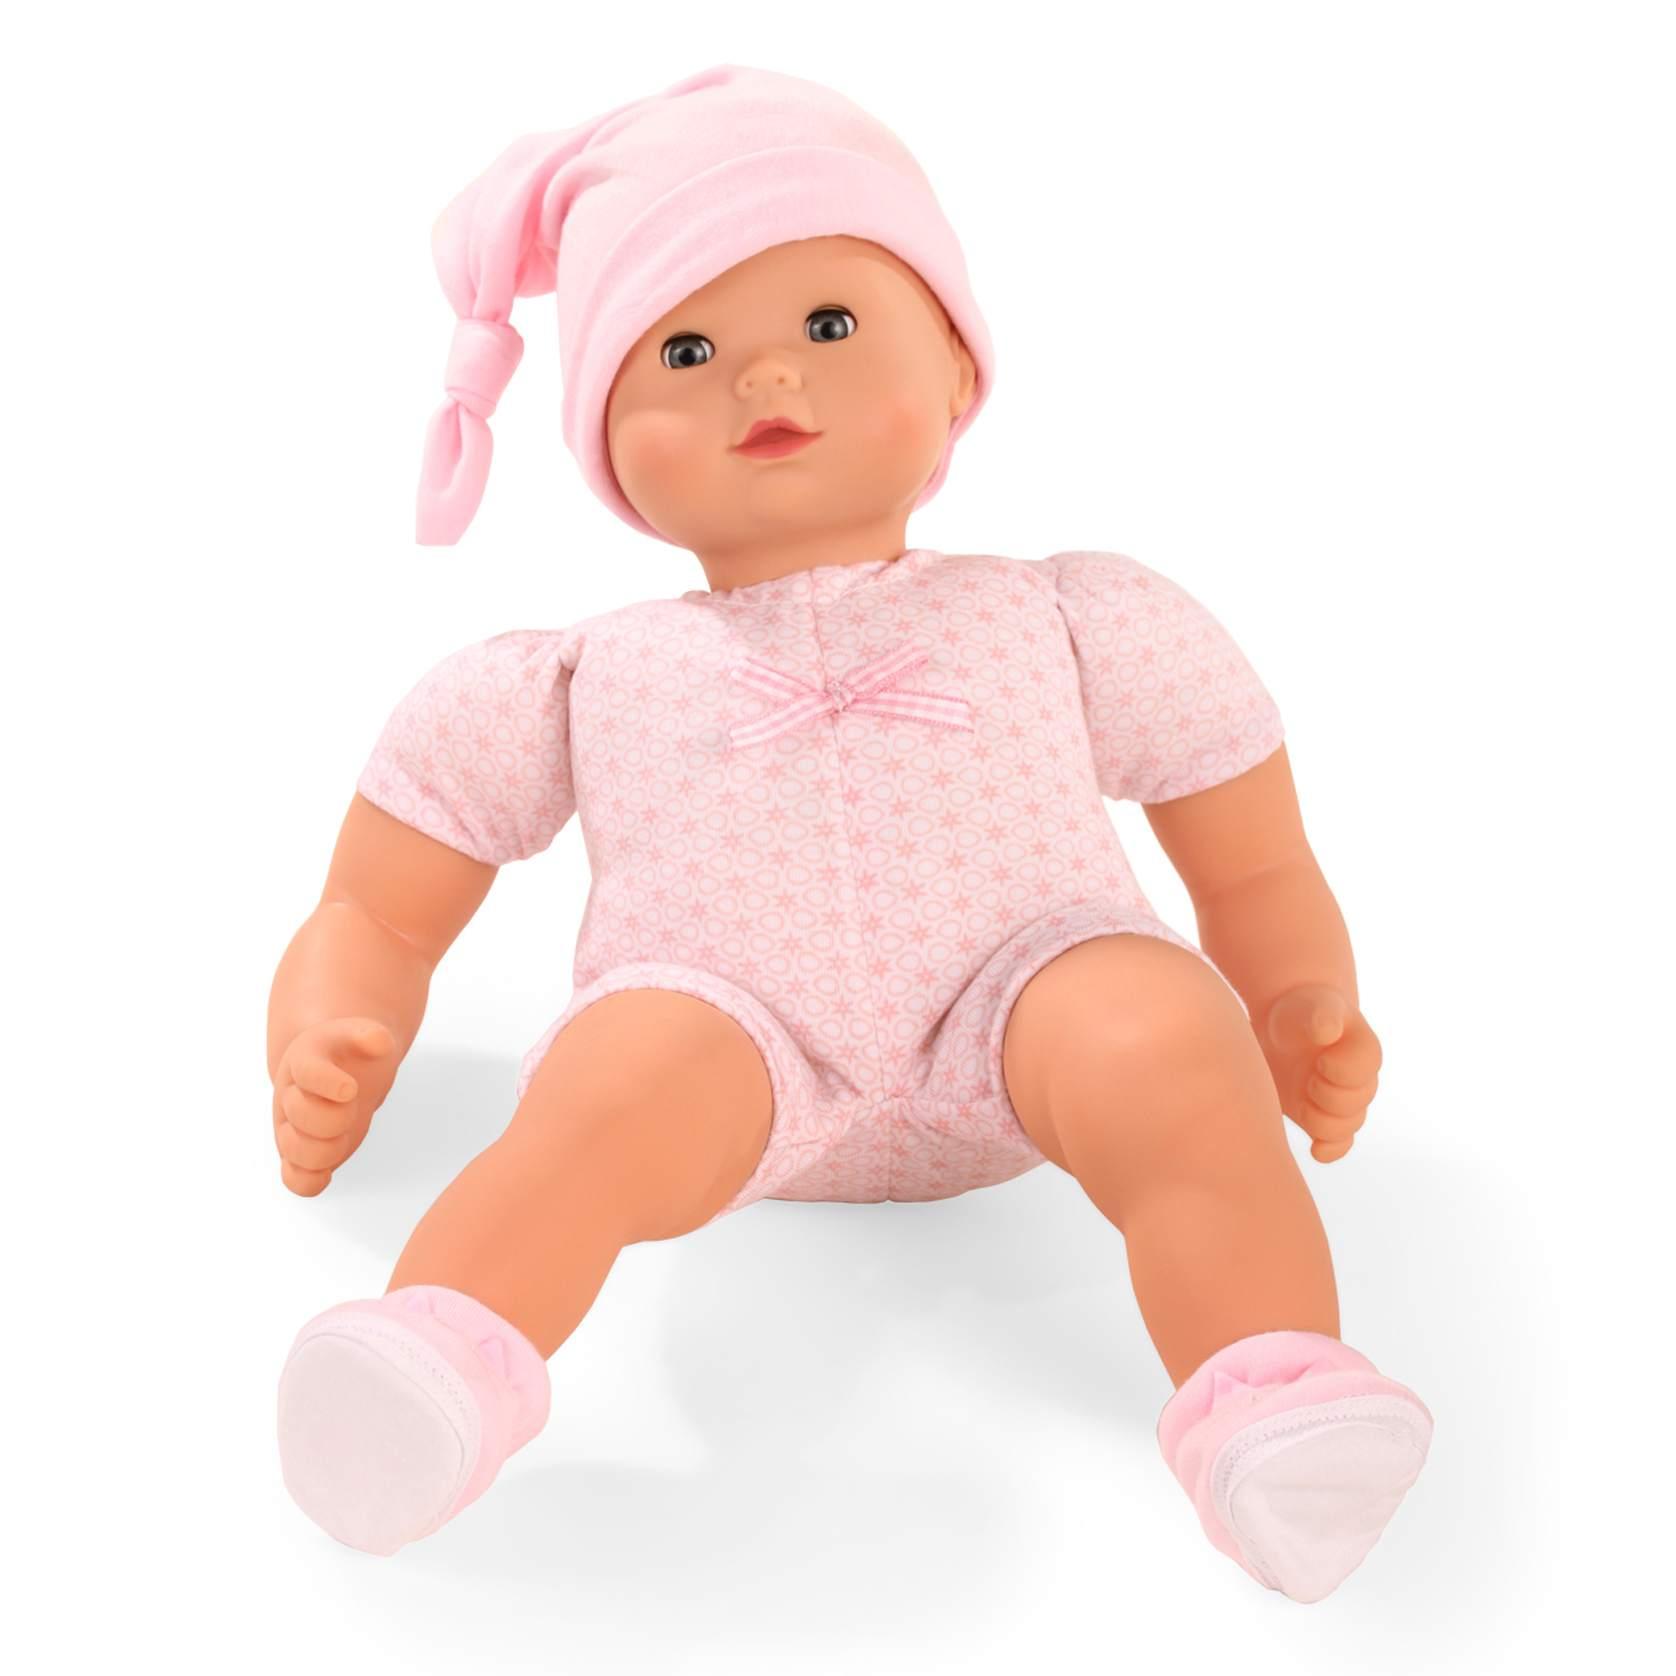 Кукла - Макси-Маффин, без волос, 42 смКуклы Gotz (Гетц)<br>Кукла - Макси-Маффин, без волос, 42 см<br>